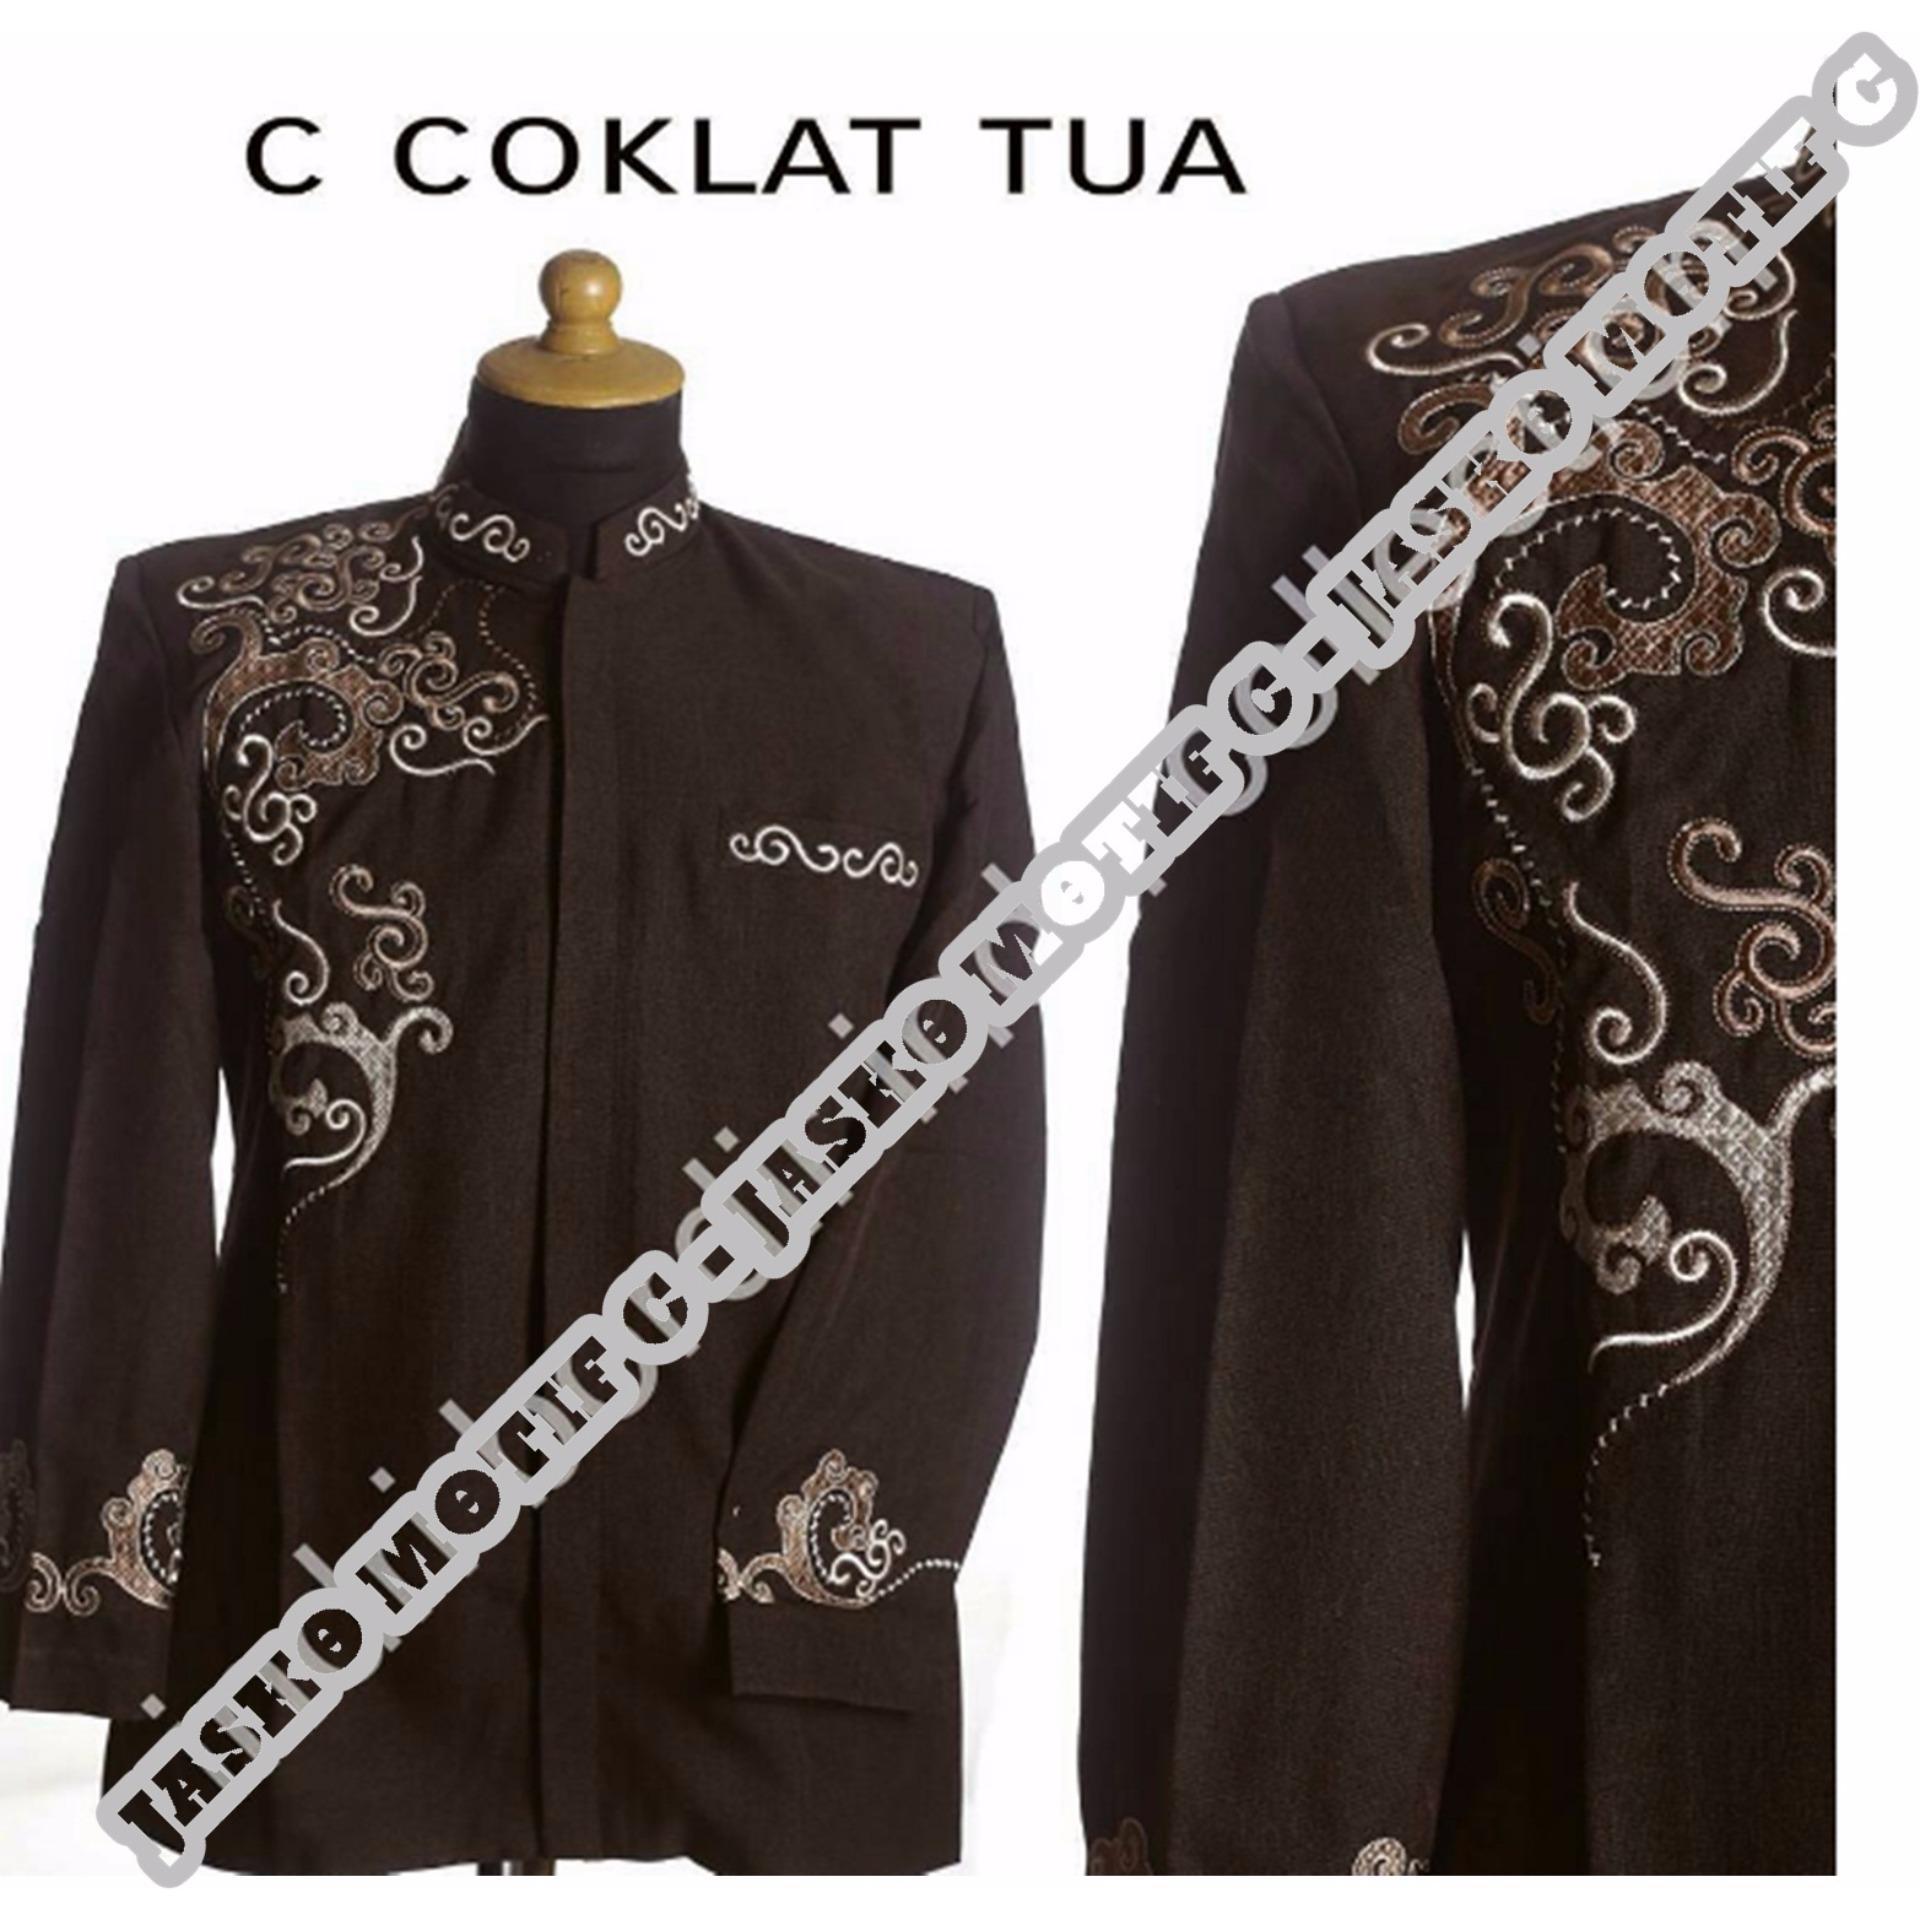 Valatex Baju Batik Motif Short Sleeve Pattern Coklat Muda Jayashree Nafira Slimfit Pria Hitam Xxl Shopping Comparison Jasko C Tua